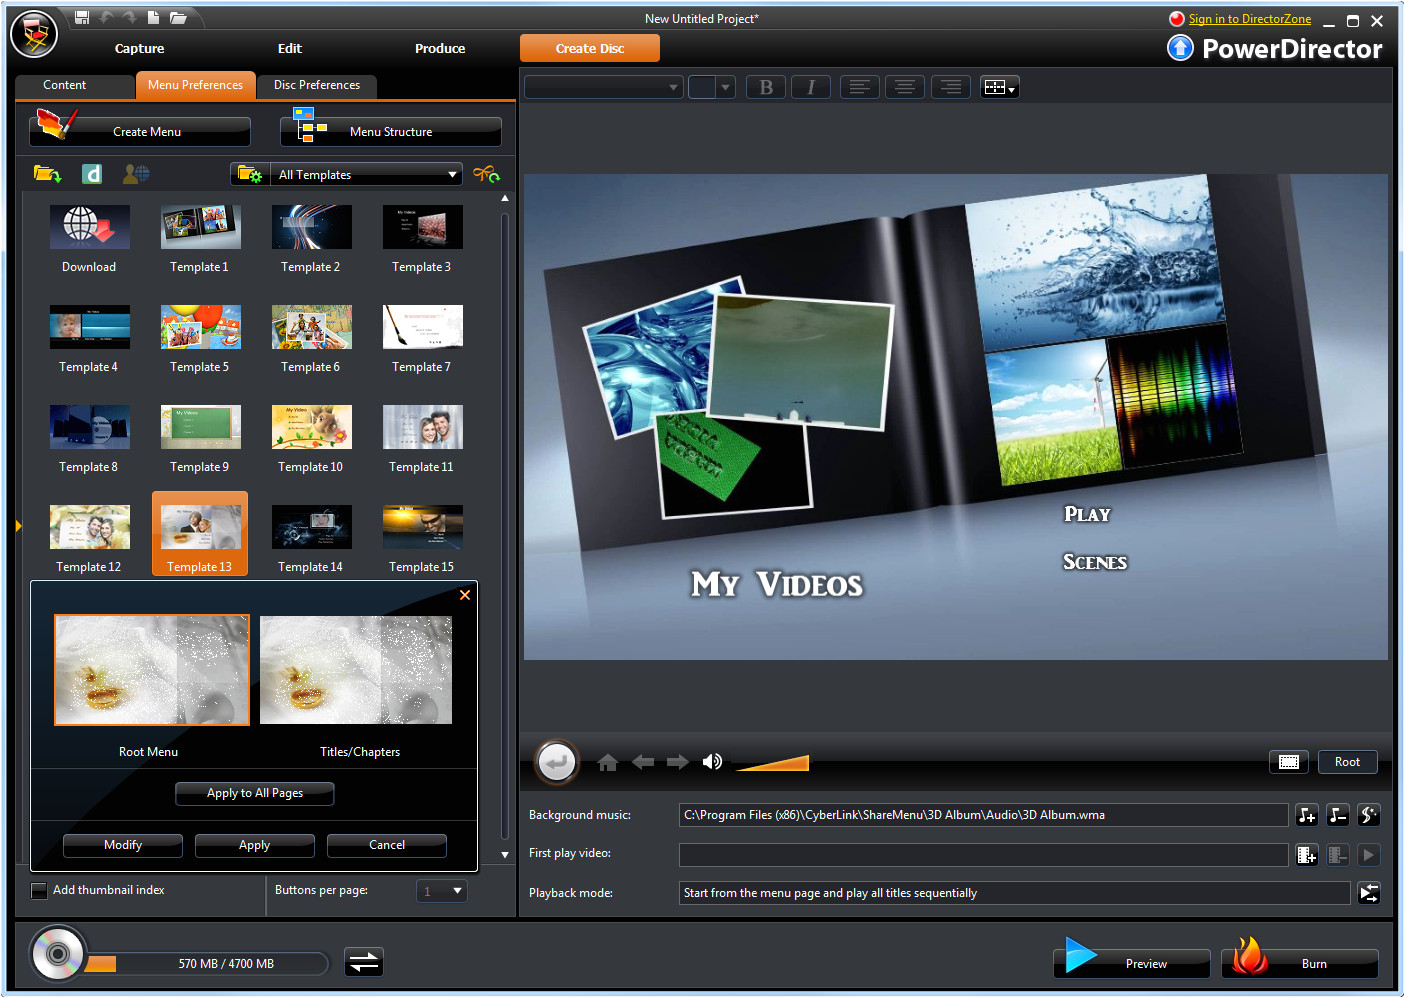 Powerdirector Menu Templates Cyberlink V Nero Media Authoring Suites the Register